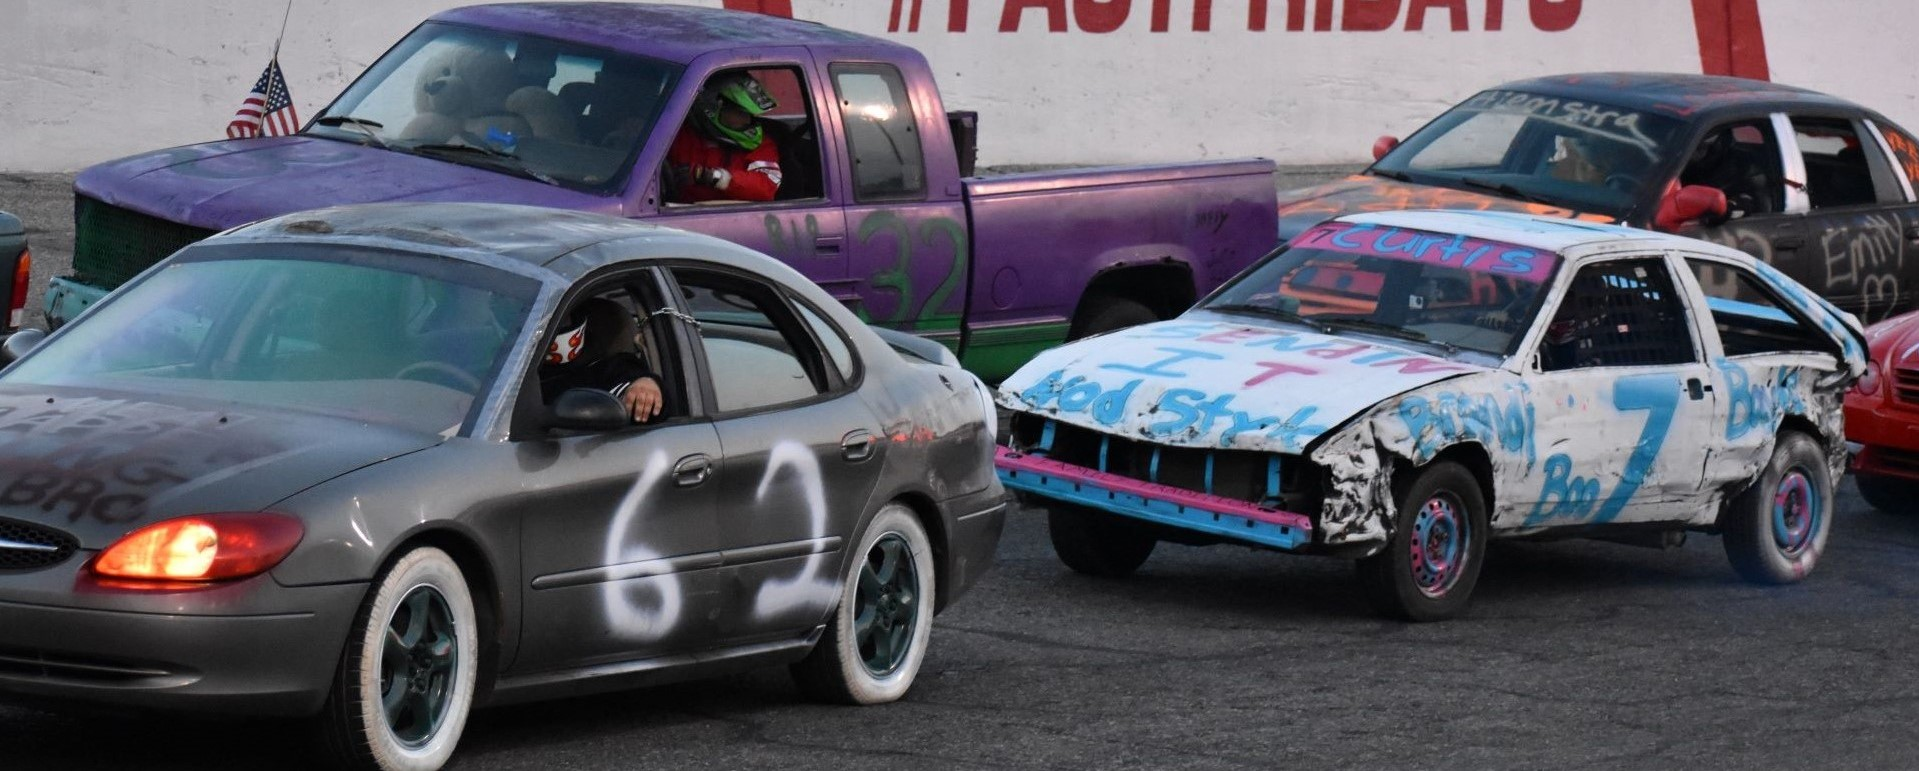 'MERICA 200 ENDURO plus - STACKER CARS - MCR DWARFS - SPECTATOR DRAGS - FIREWORKS!